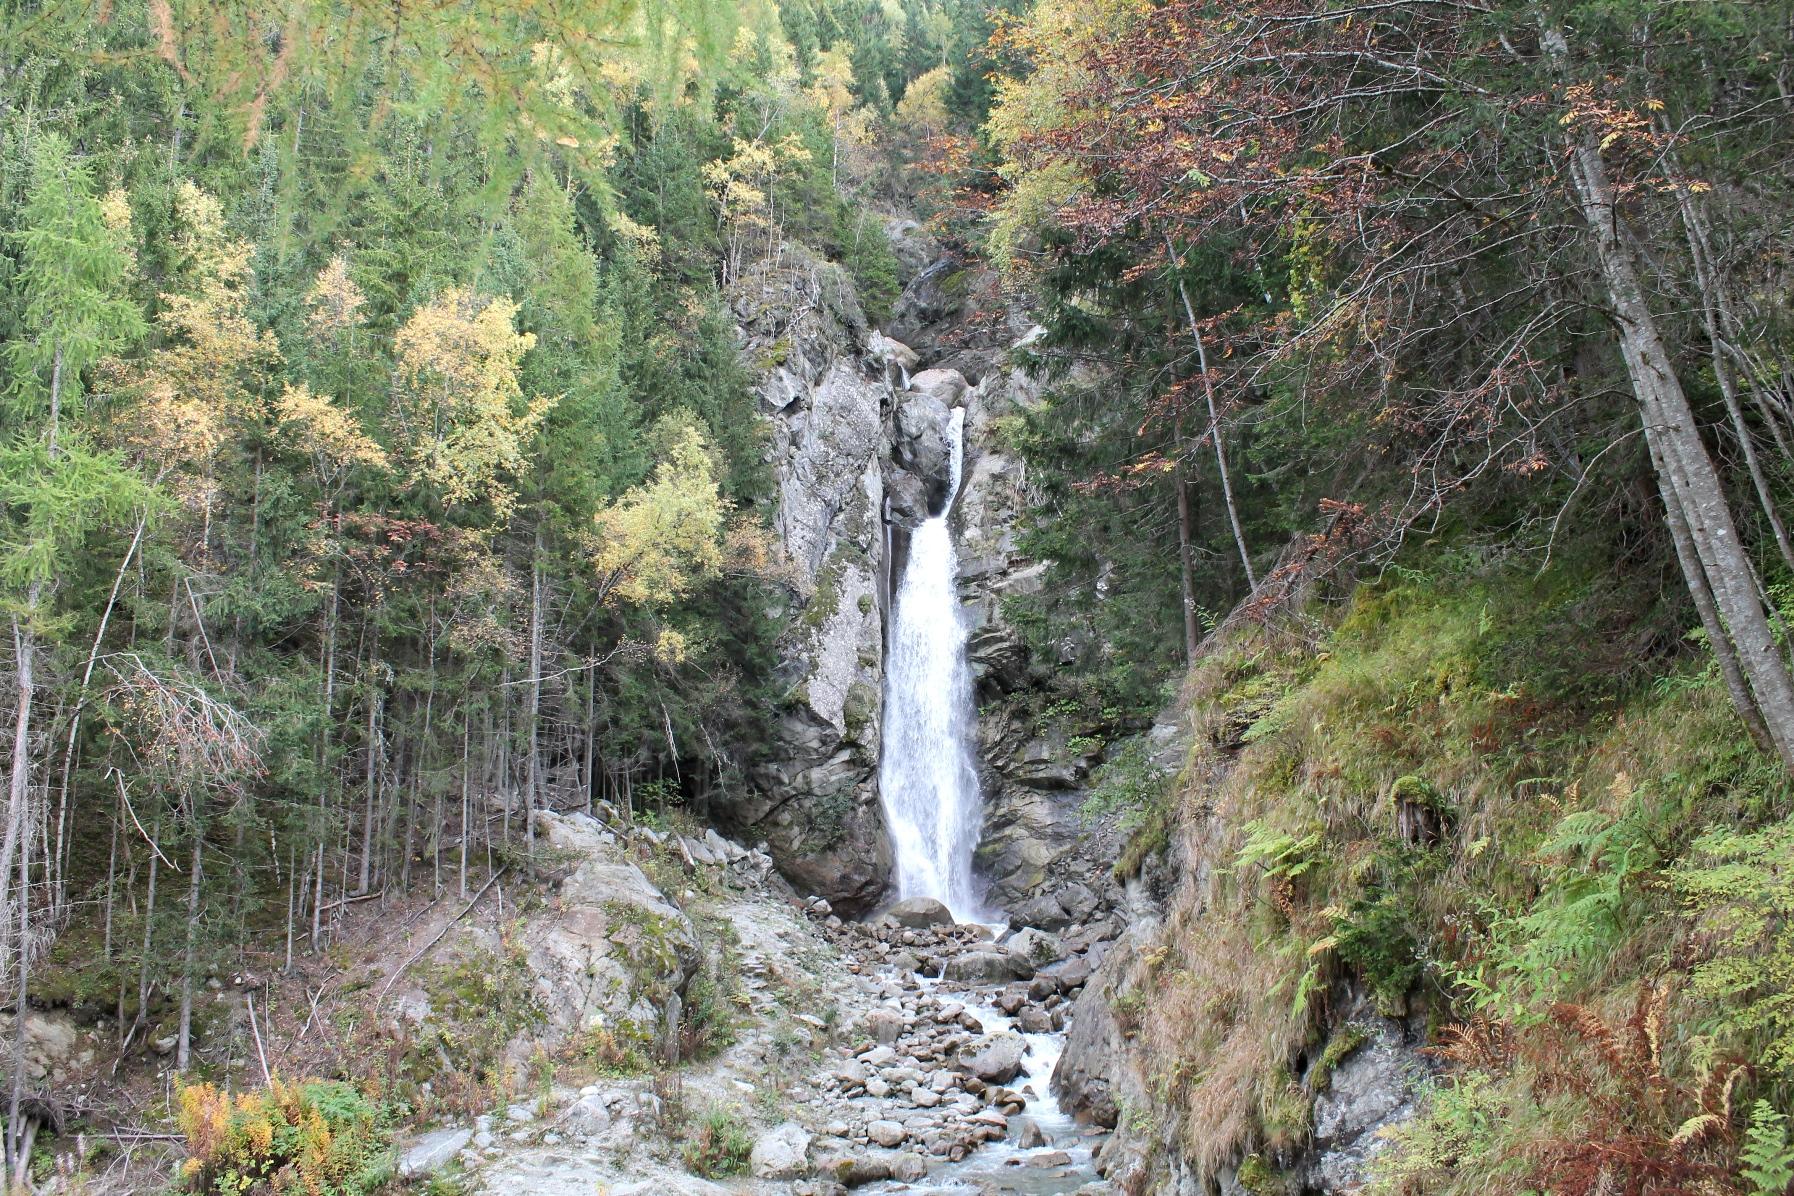 Hiking to Cascade Du Dard and Glacier Cerro, Chamonix, France